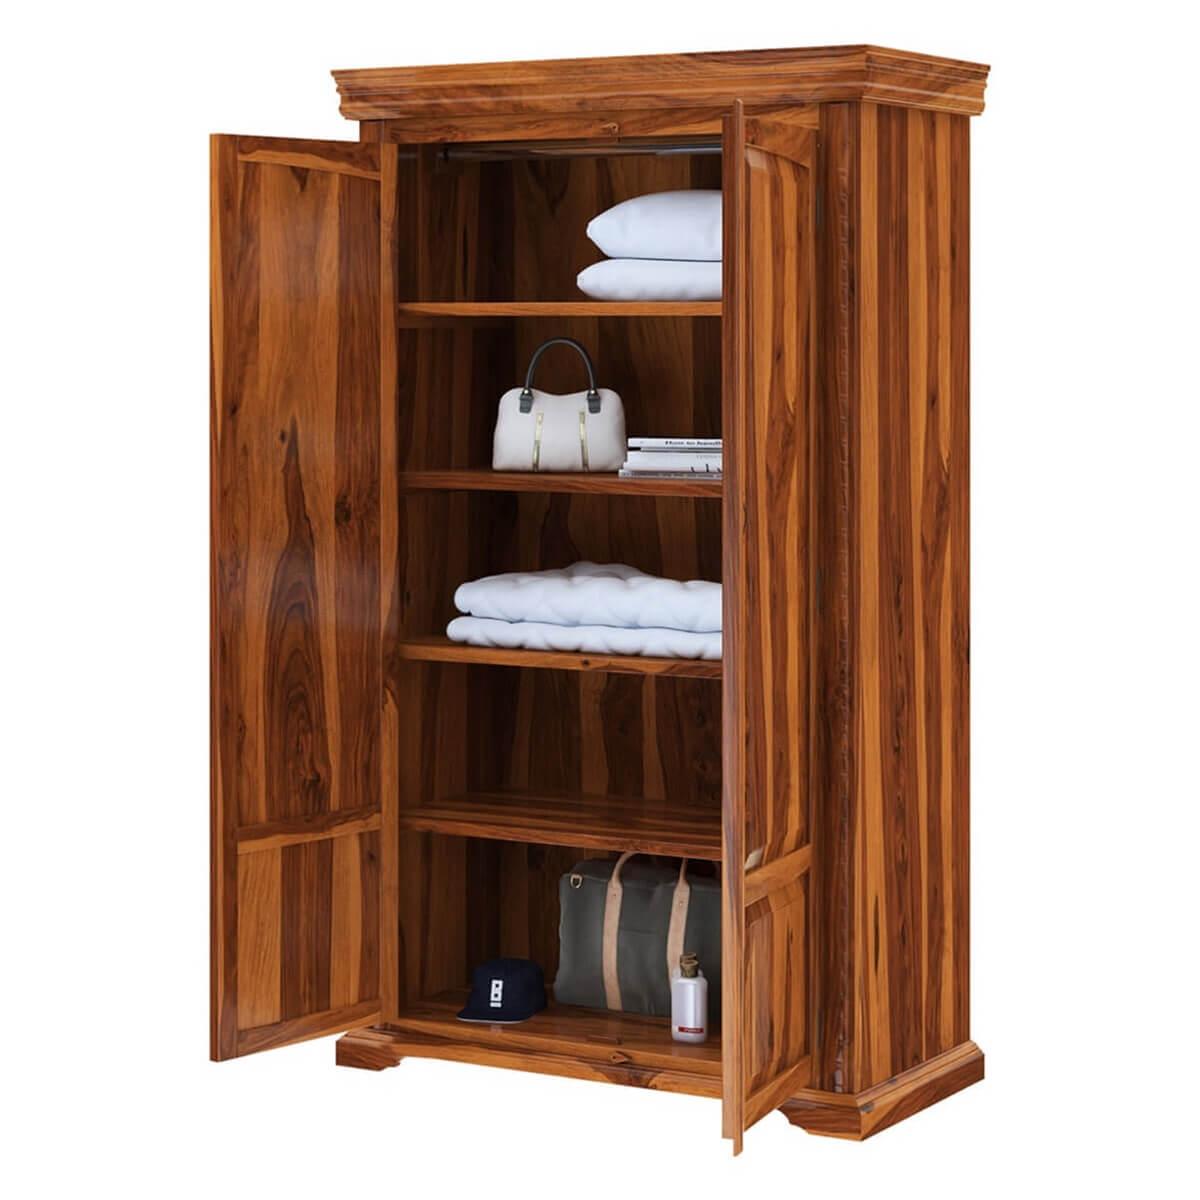 Empire Bedroom Rustic Solid Wood Large Armoire Wardrobe ...